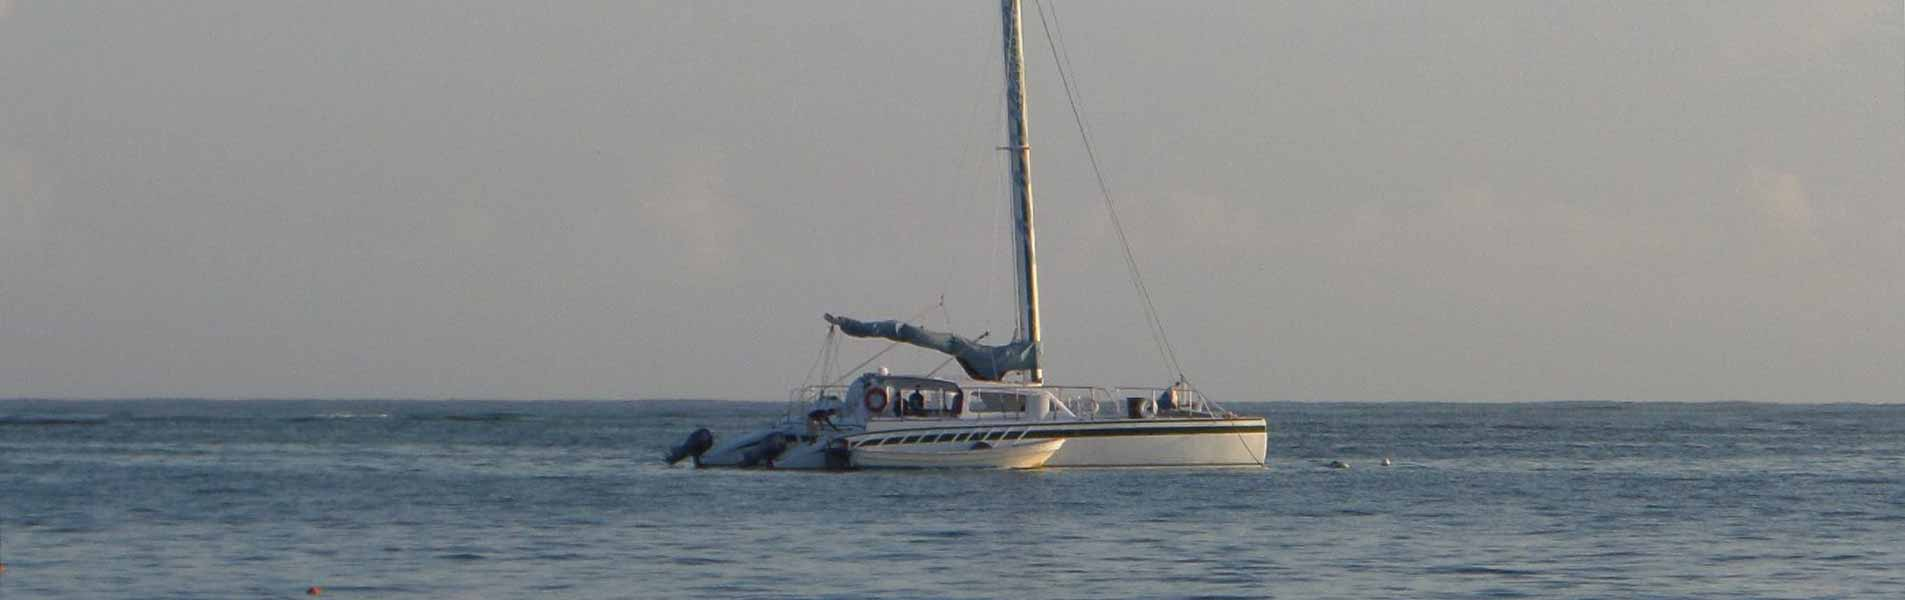 location bateau seignosse